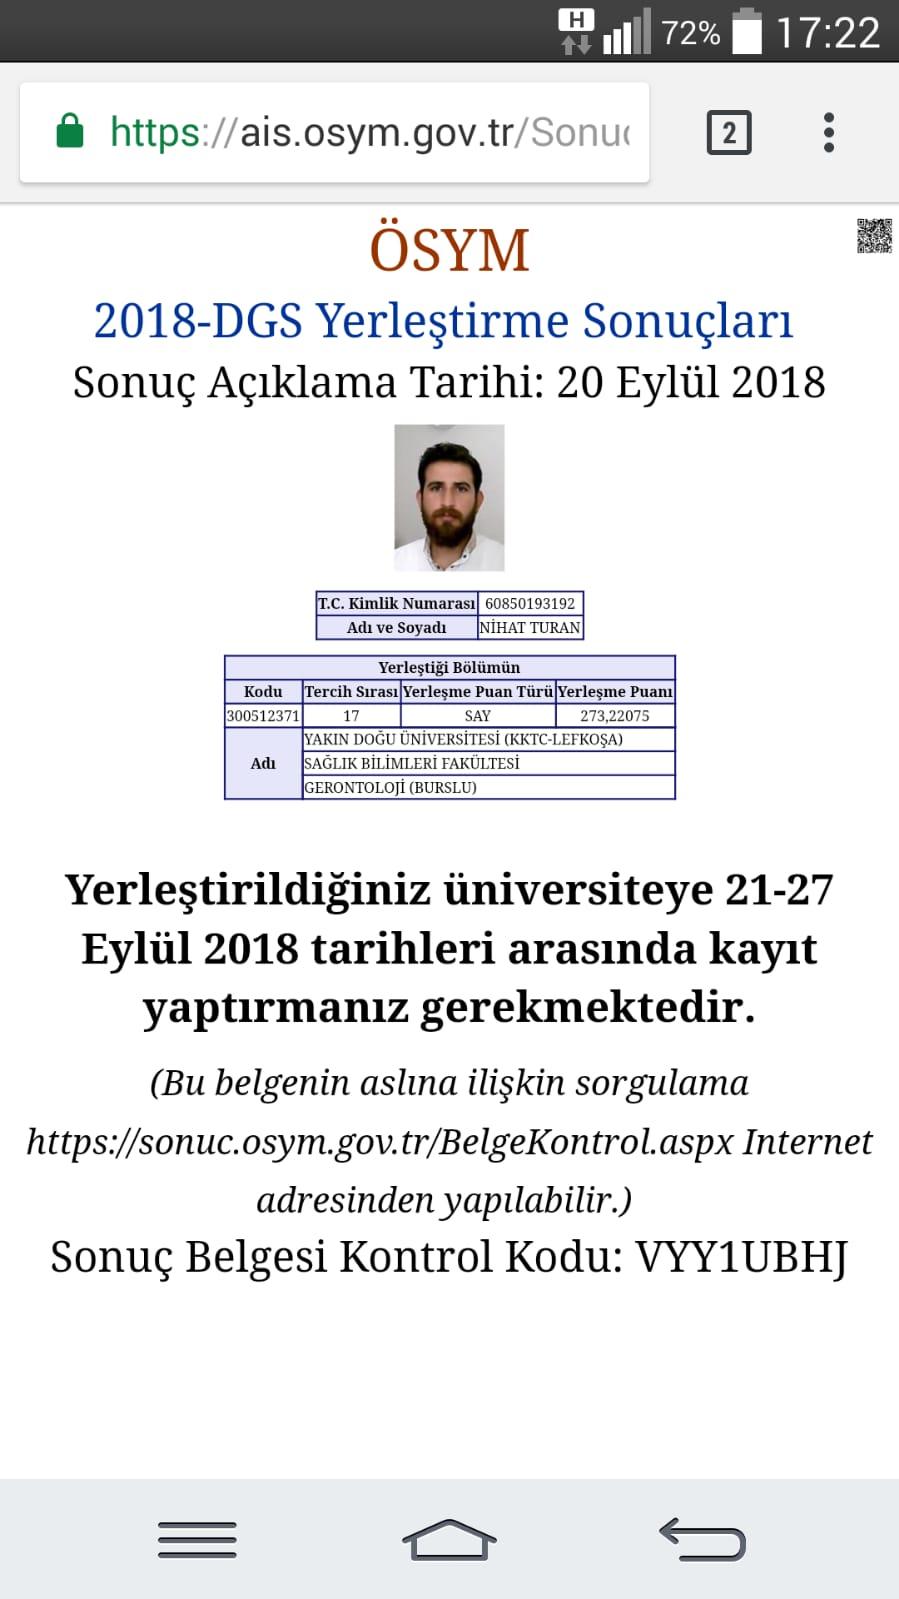 sayisal-5-nihat-turan